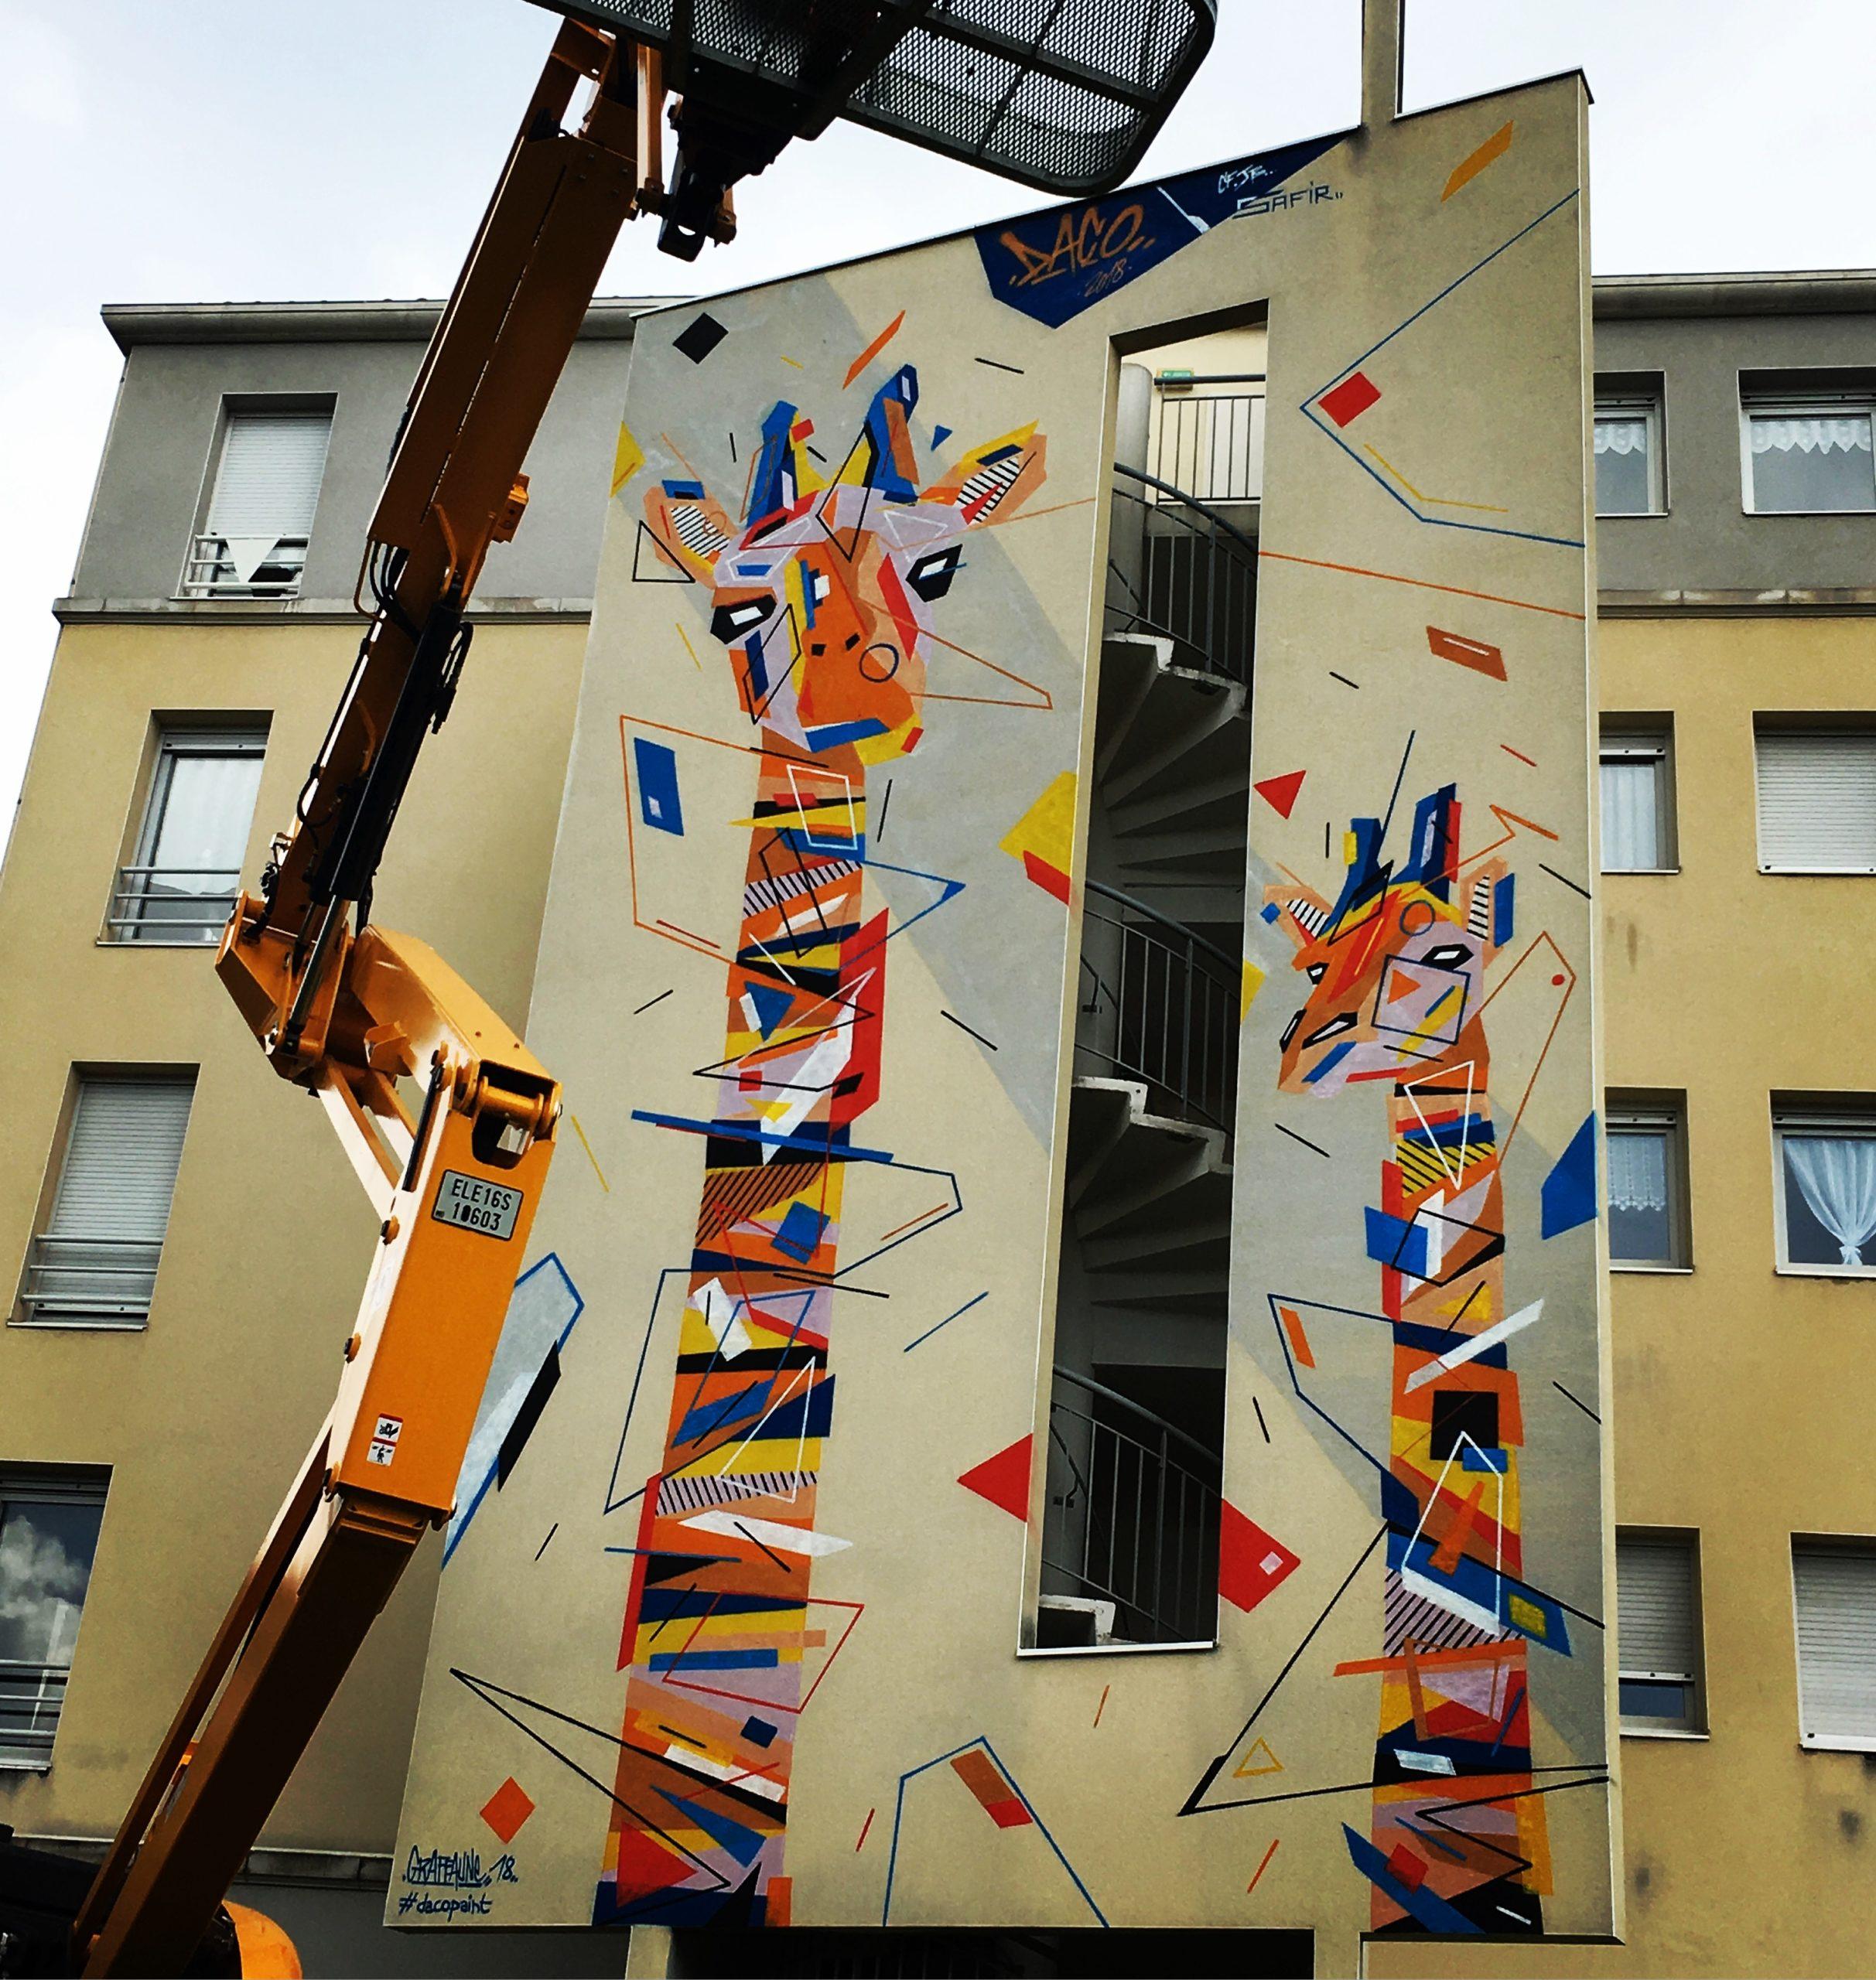 Fresque Graffaune Graffiti girafes réalisée par Daco